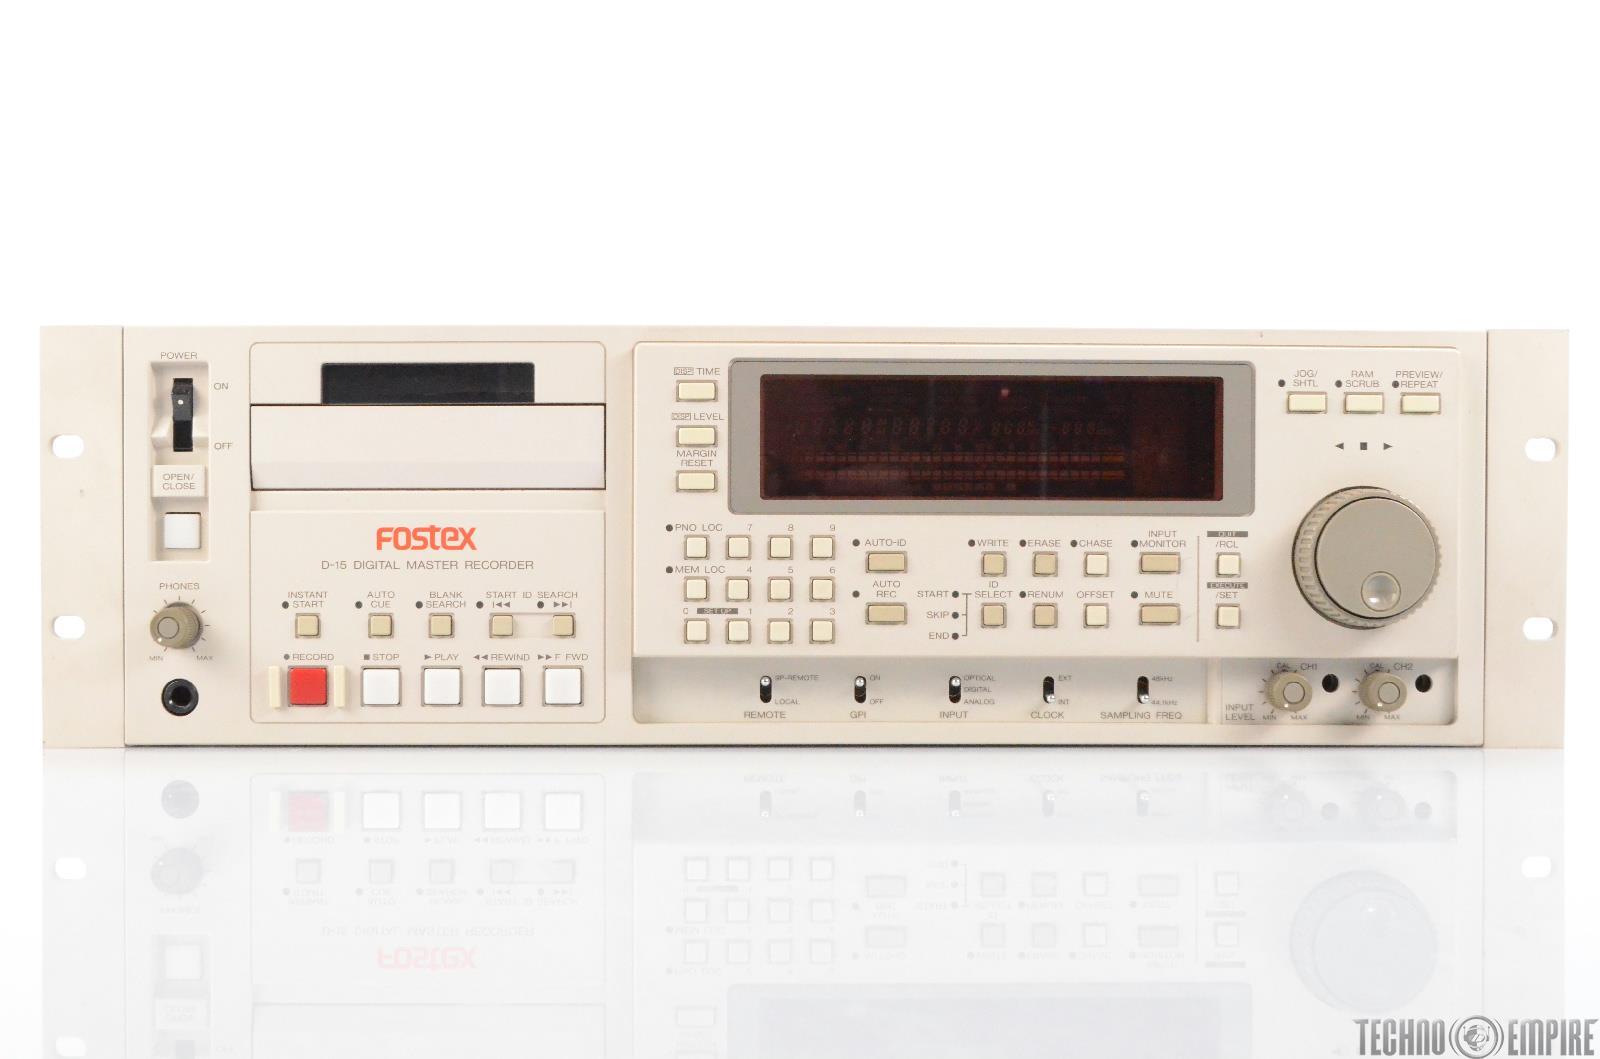 Fostex D-15 Digital Master Recorder DAT Tape D15 #29501